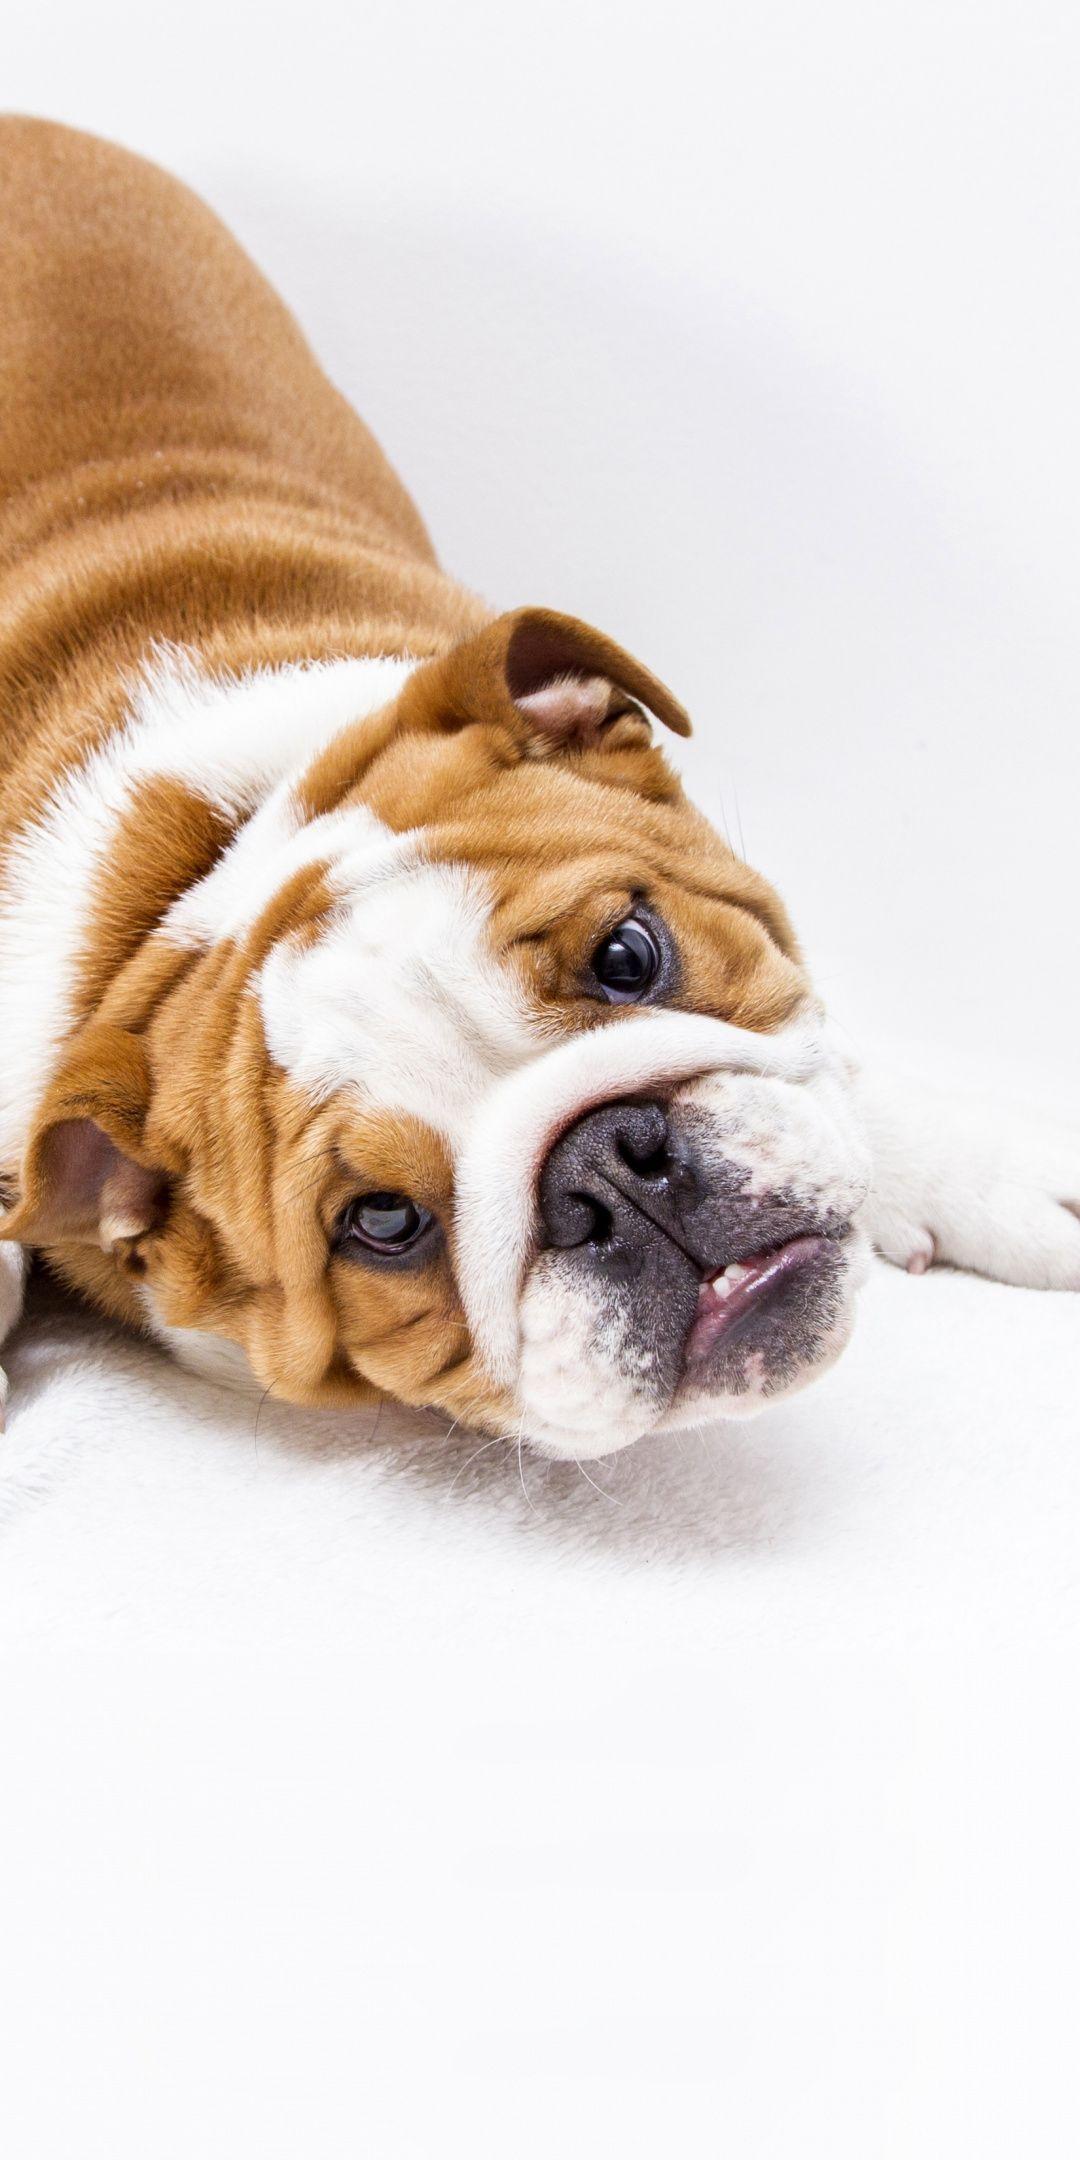 Puppy Cute Dog Play 1080x2160 Wallpaper Cute Animals